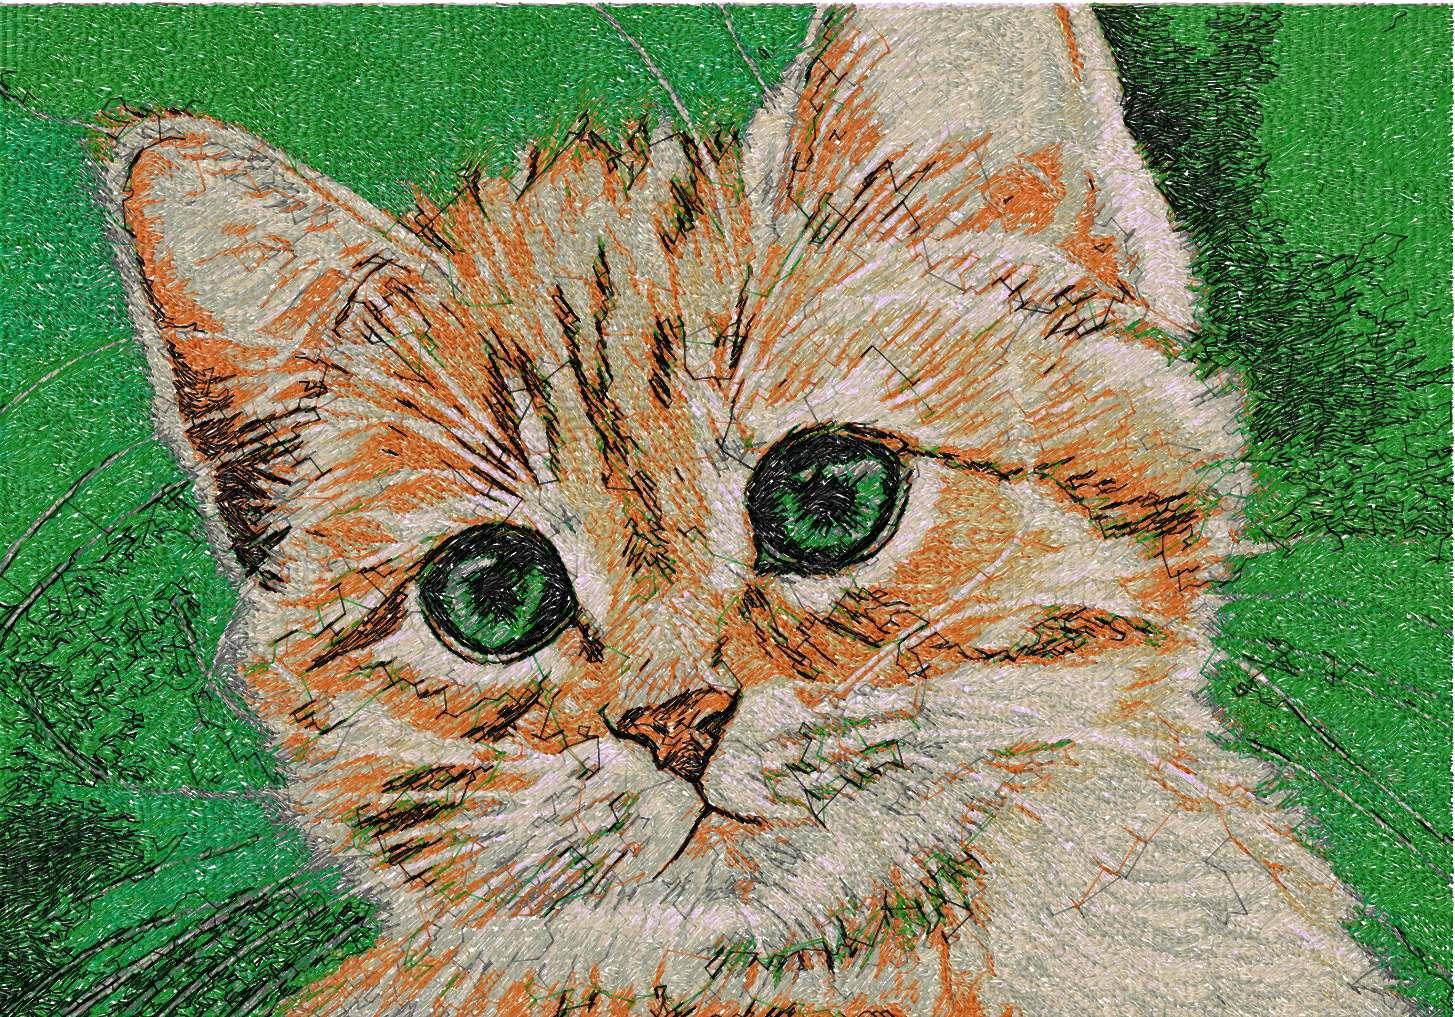 Kitten photo stitch free embroidery design 8